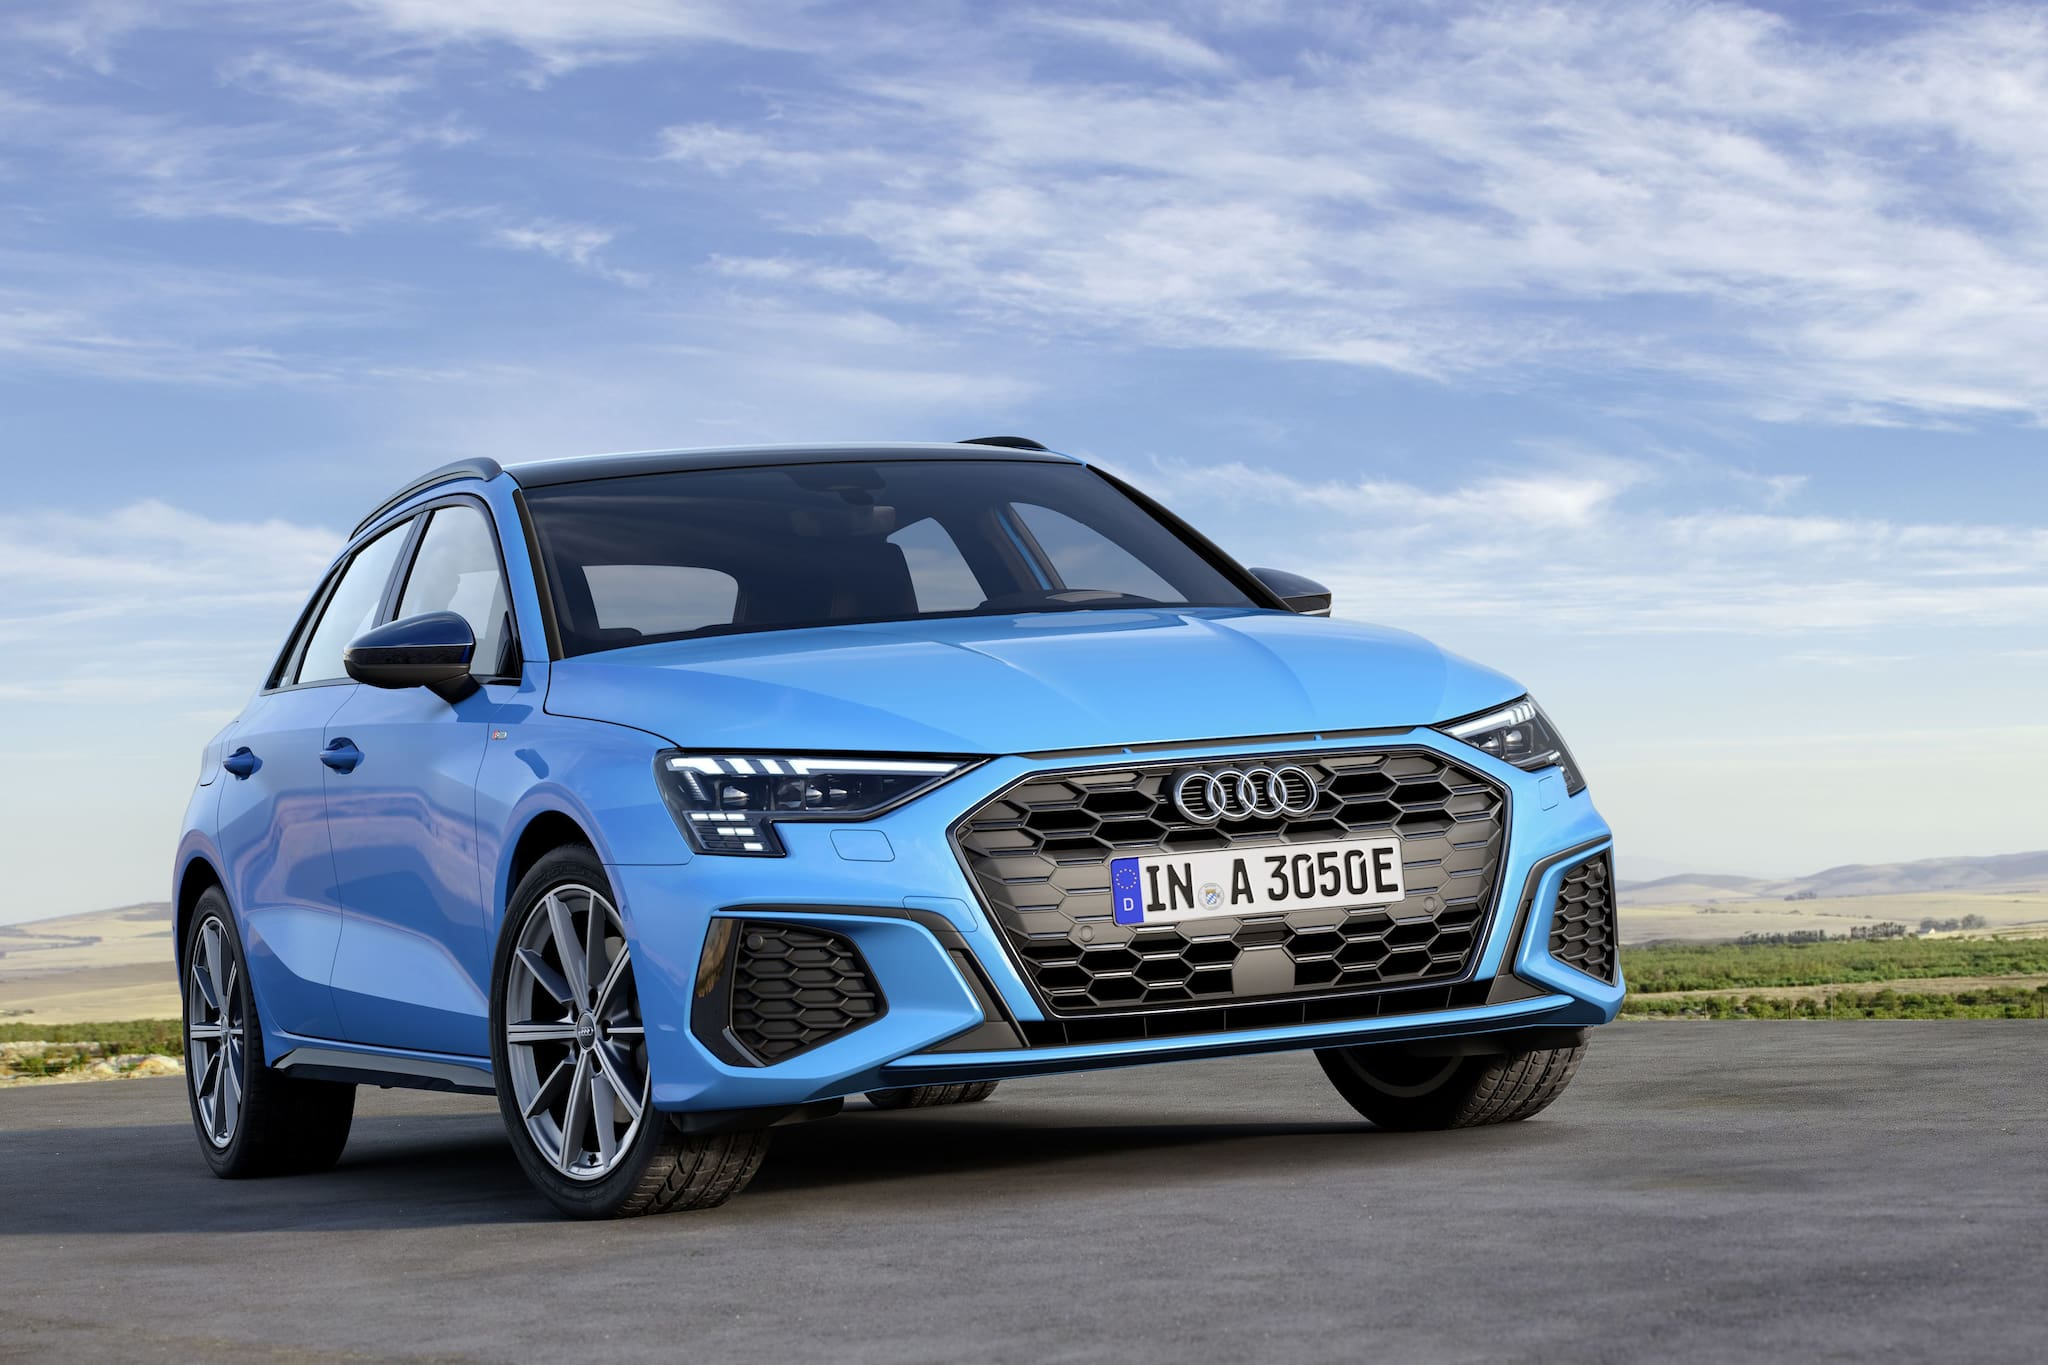 Audi-A3-Sportback-40-TFSI-e-body-photo-1